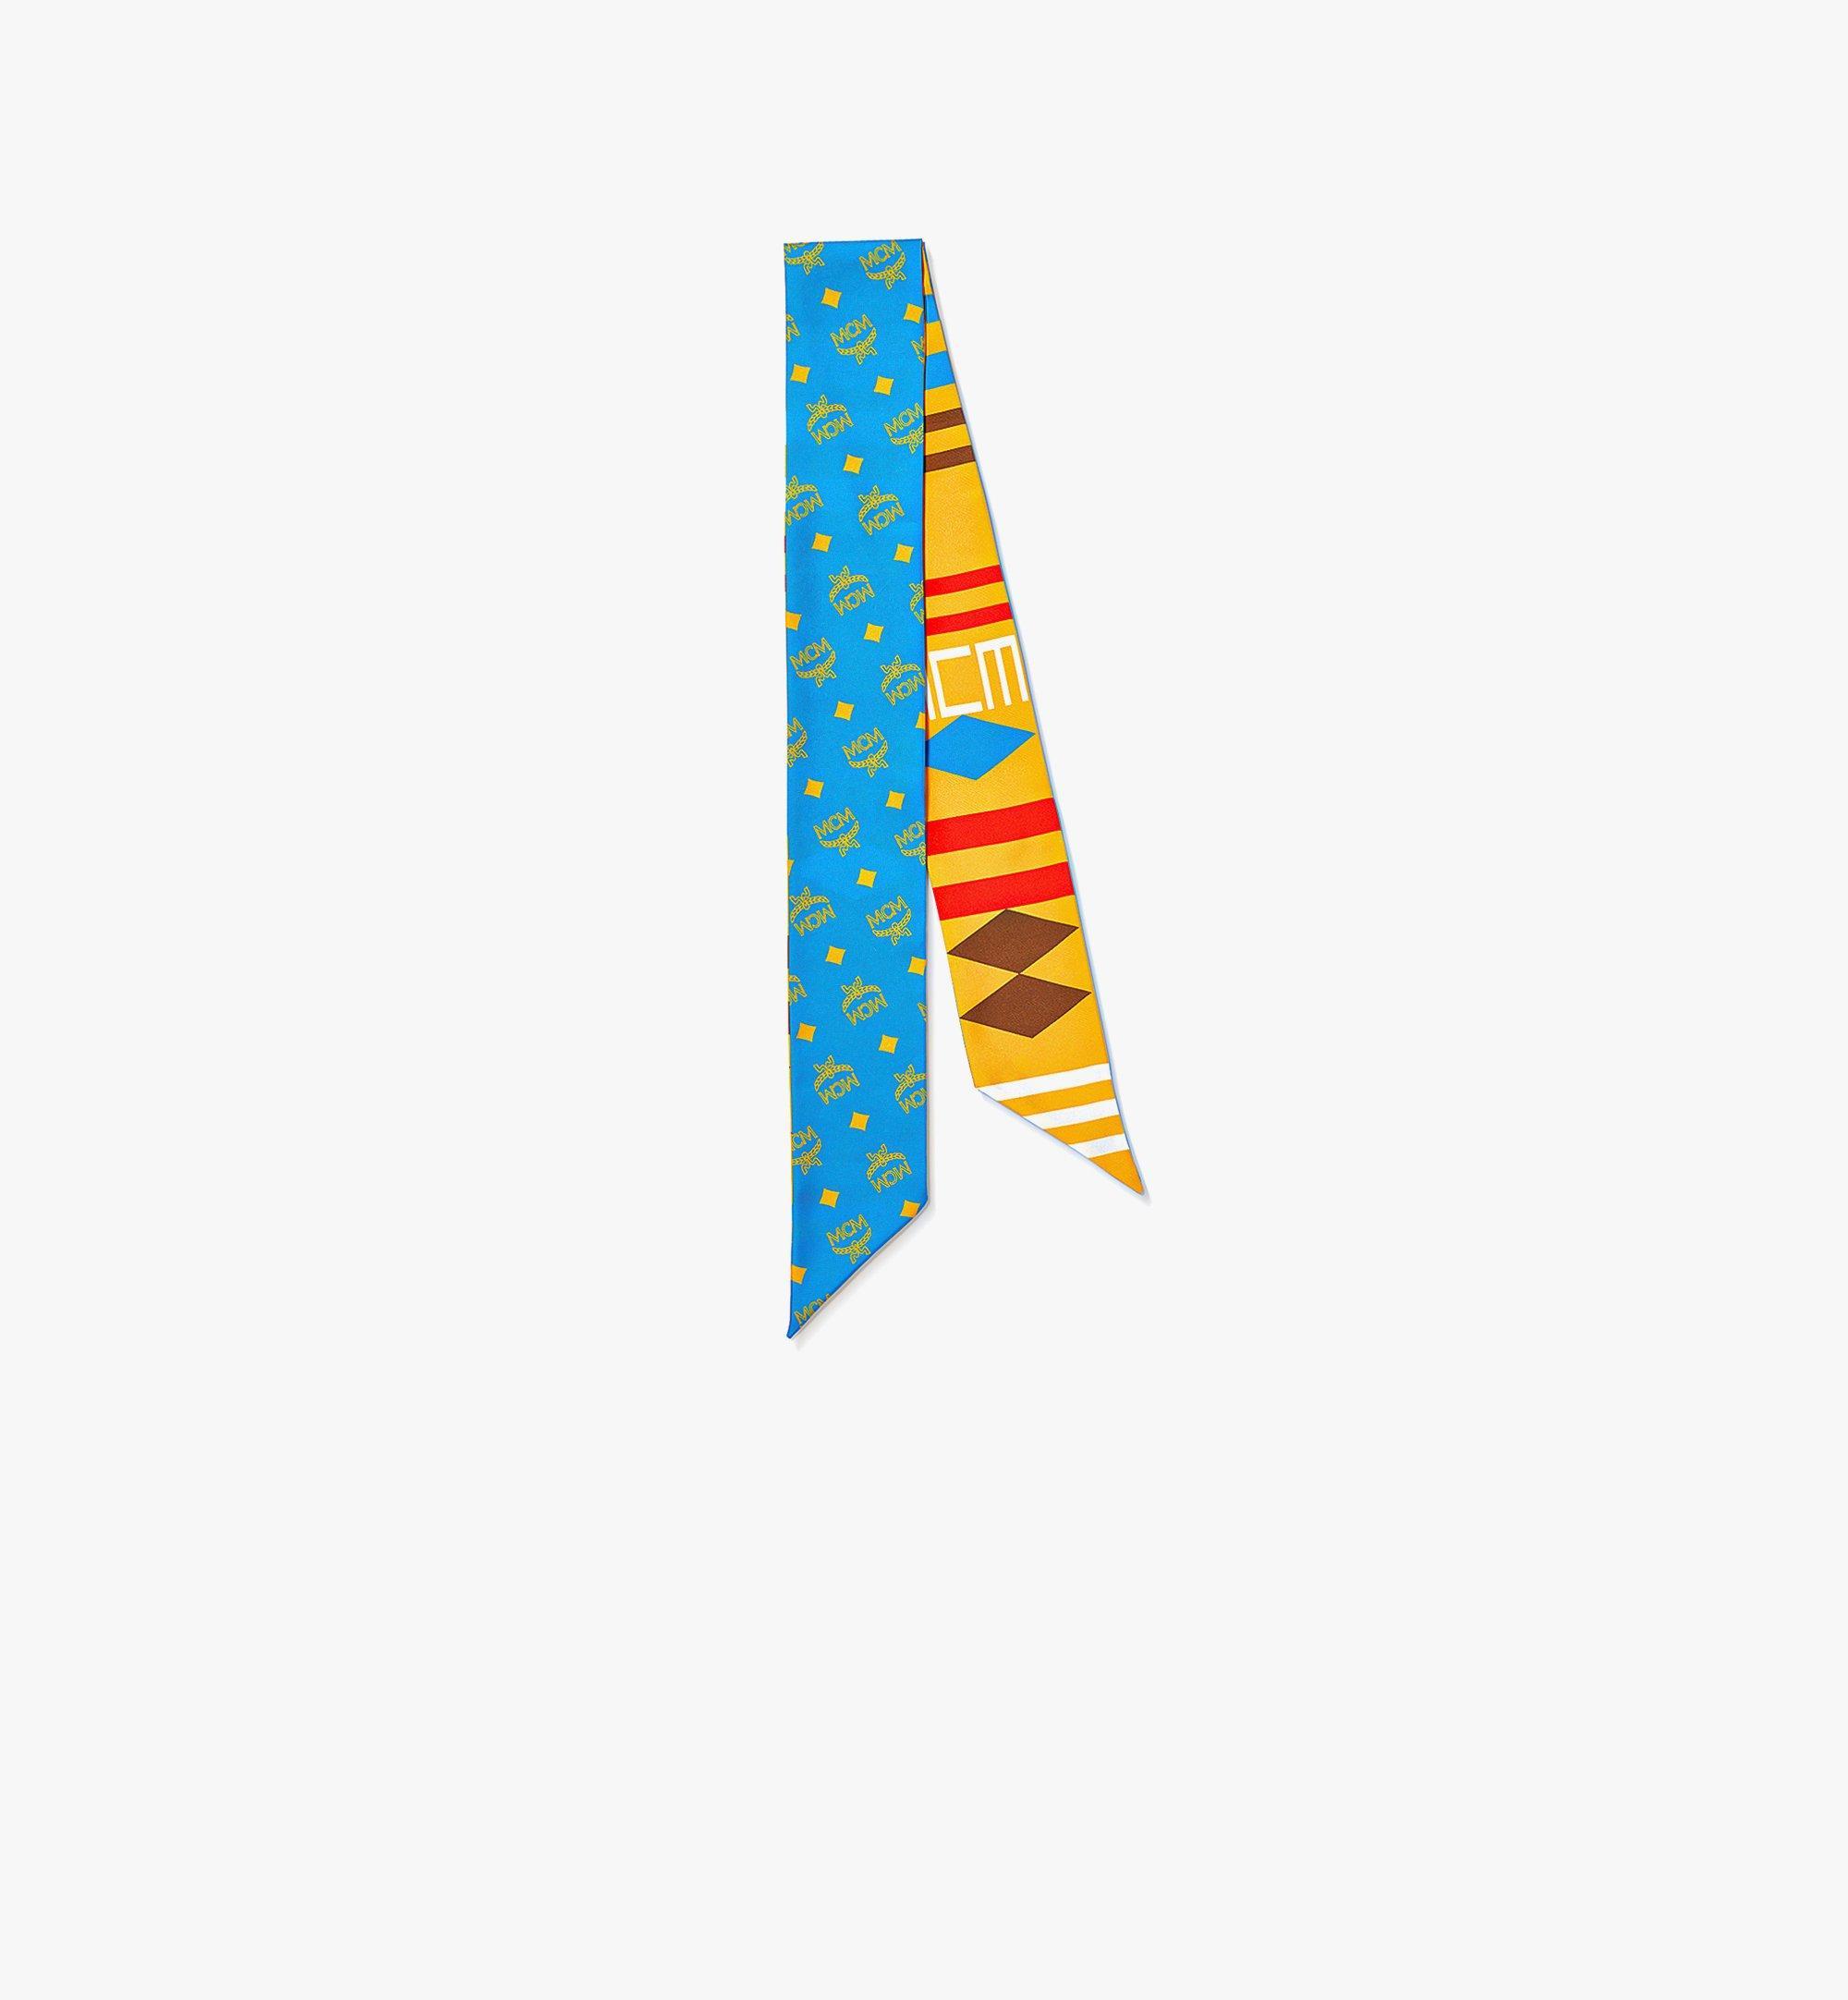 MCM Geo 塗鴉真絲斜紋圍巾 Blue MEFBSMM10H7001 更多視圖 1